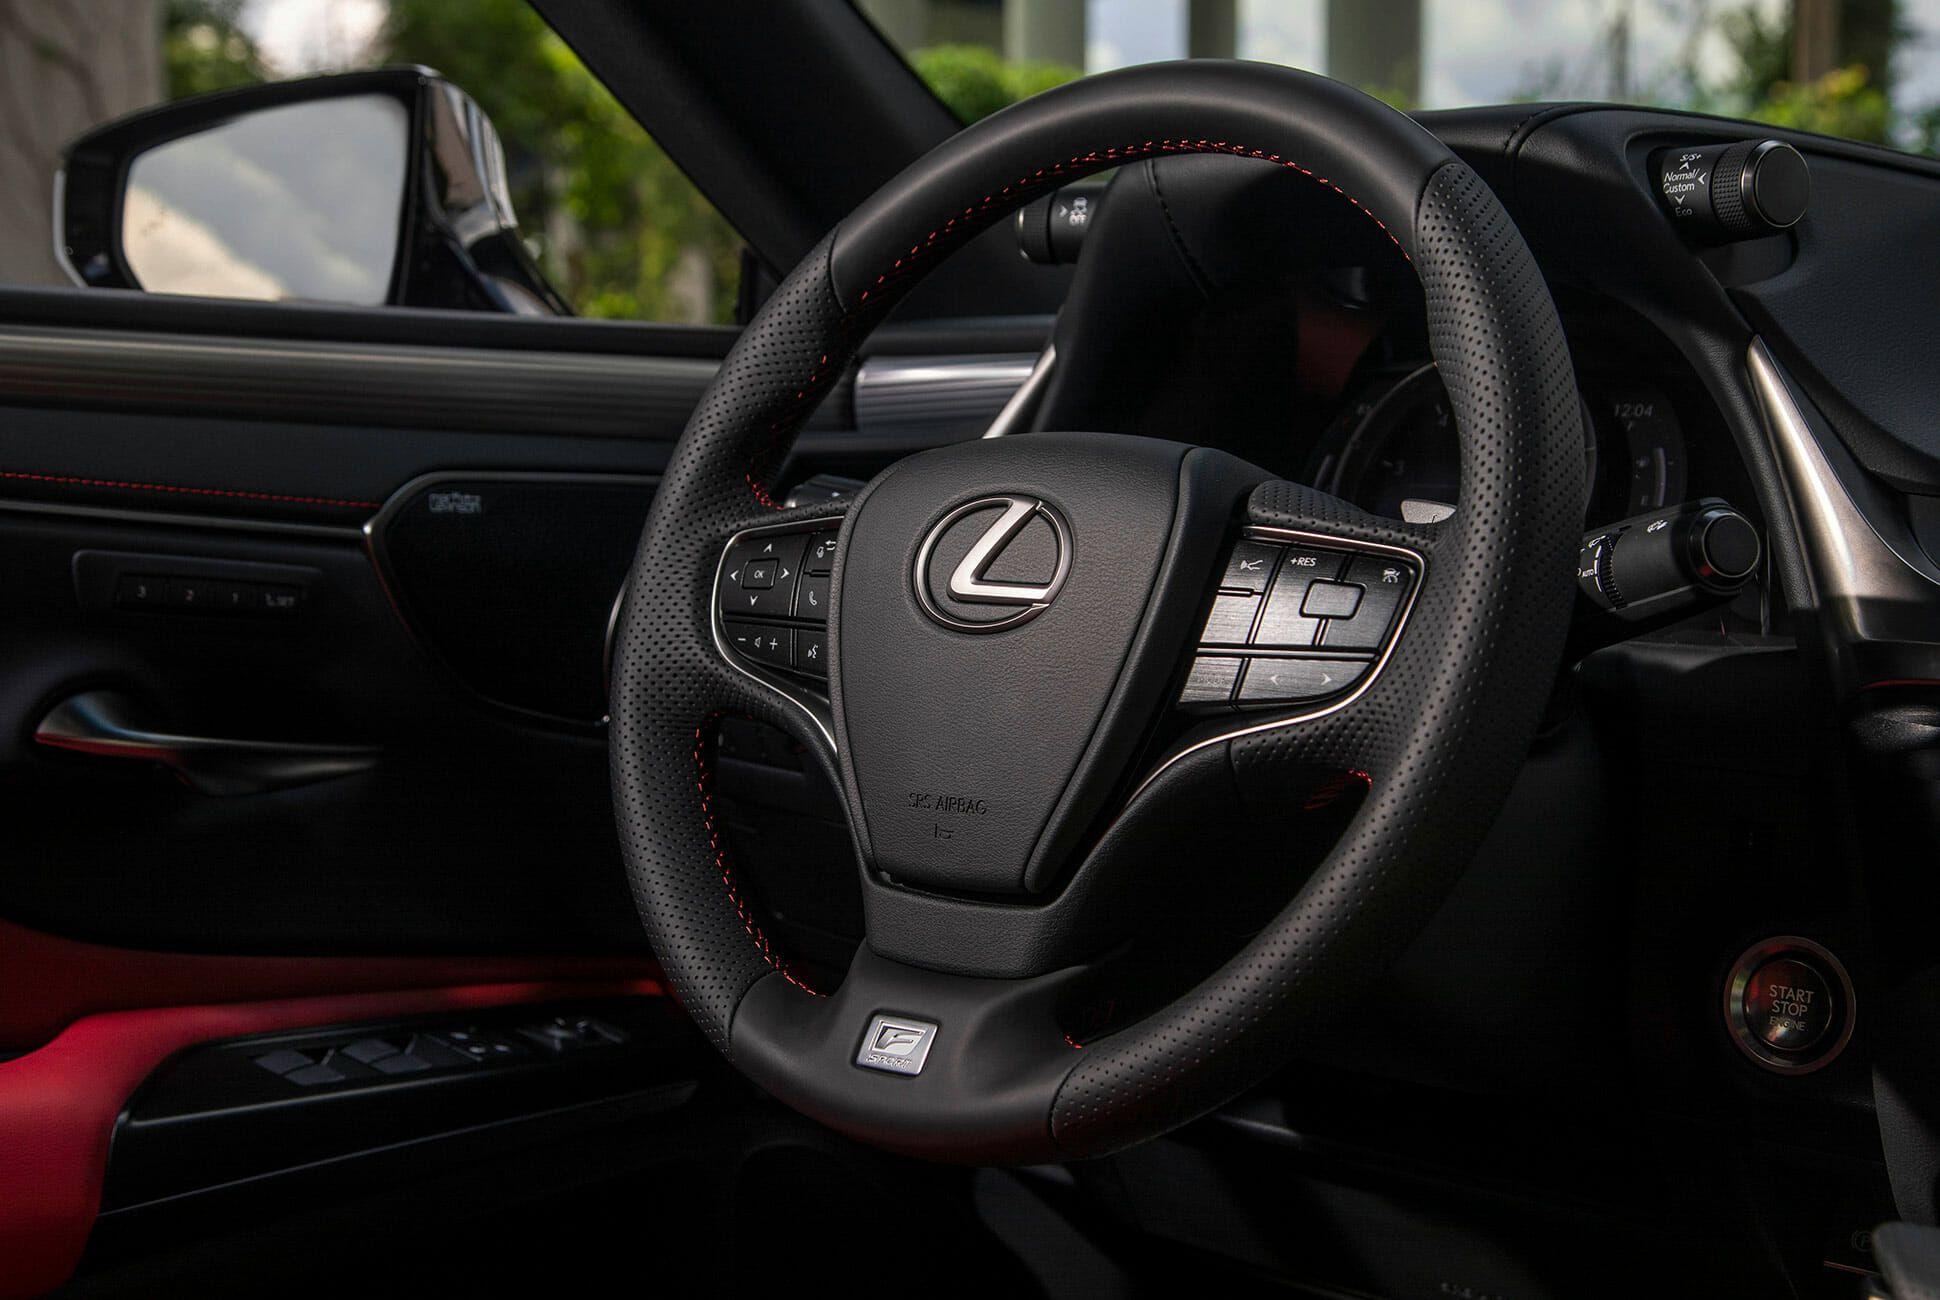 2019-Lexus-ES-350-F-Sport-Review-gear-patrol-slide-10